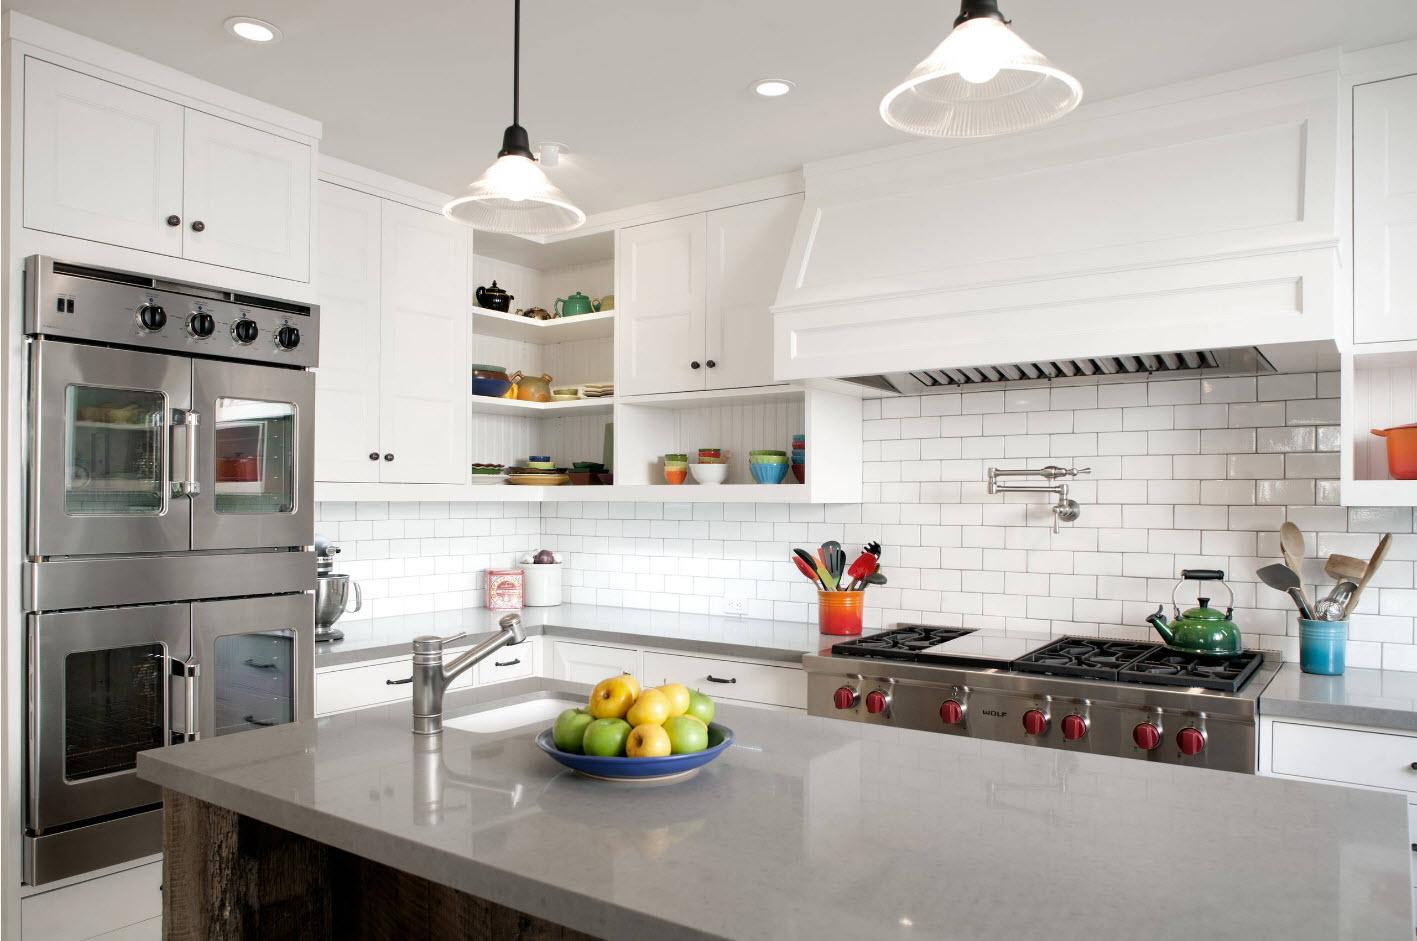 Angular Kitchen Layout Design Ideas 2017. Modern rusticality through interpretation of top-class accessories and materials